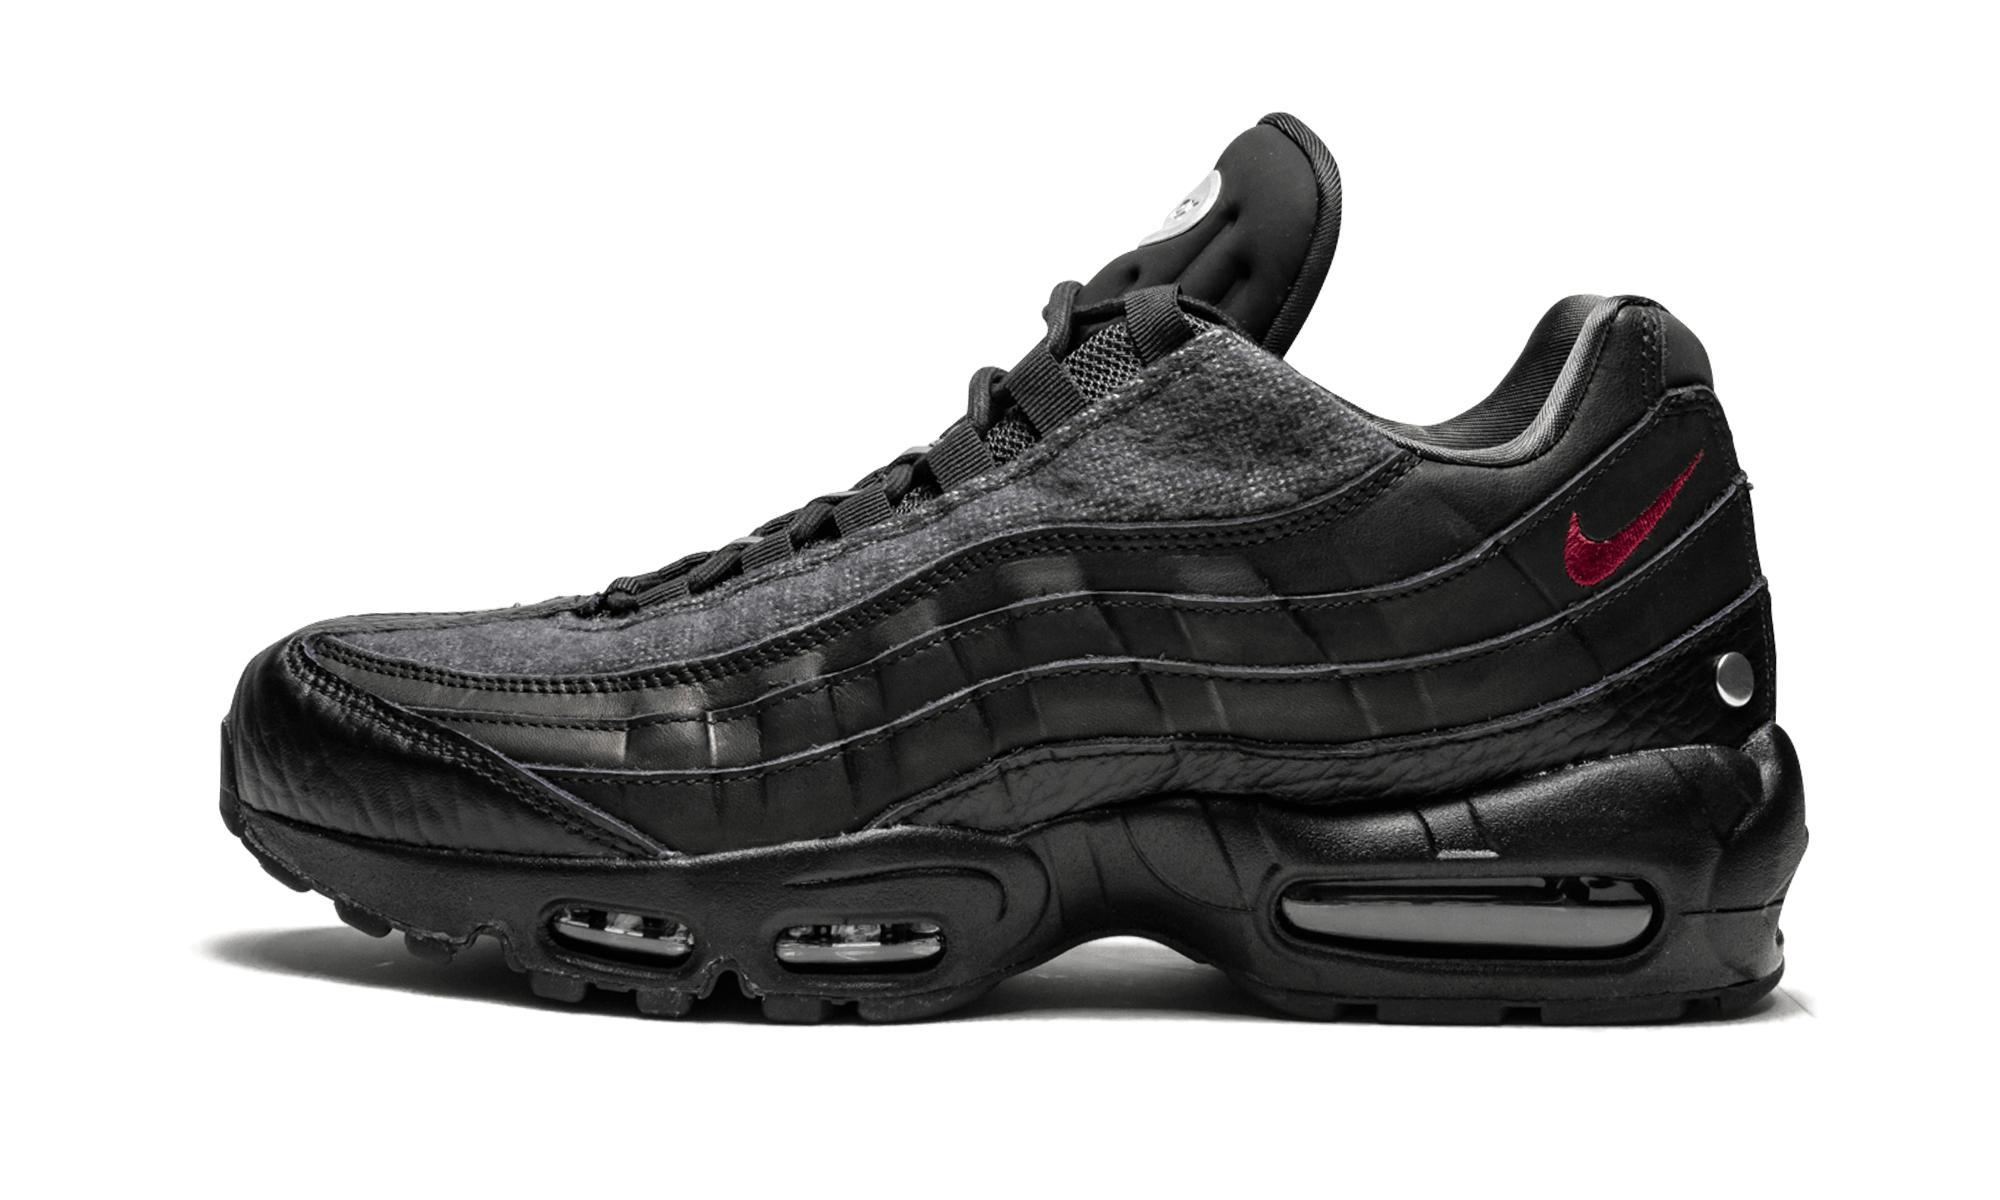 31fe4c5edbdc52 Lyst - Nike Air Max 95 Nrg in Black for Men